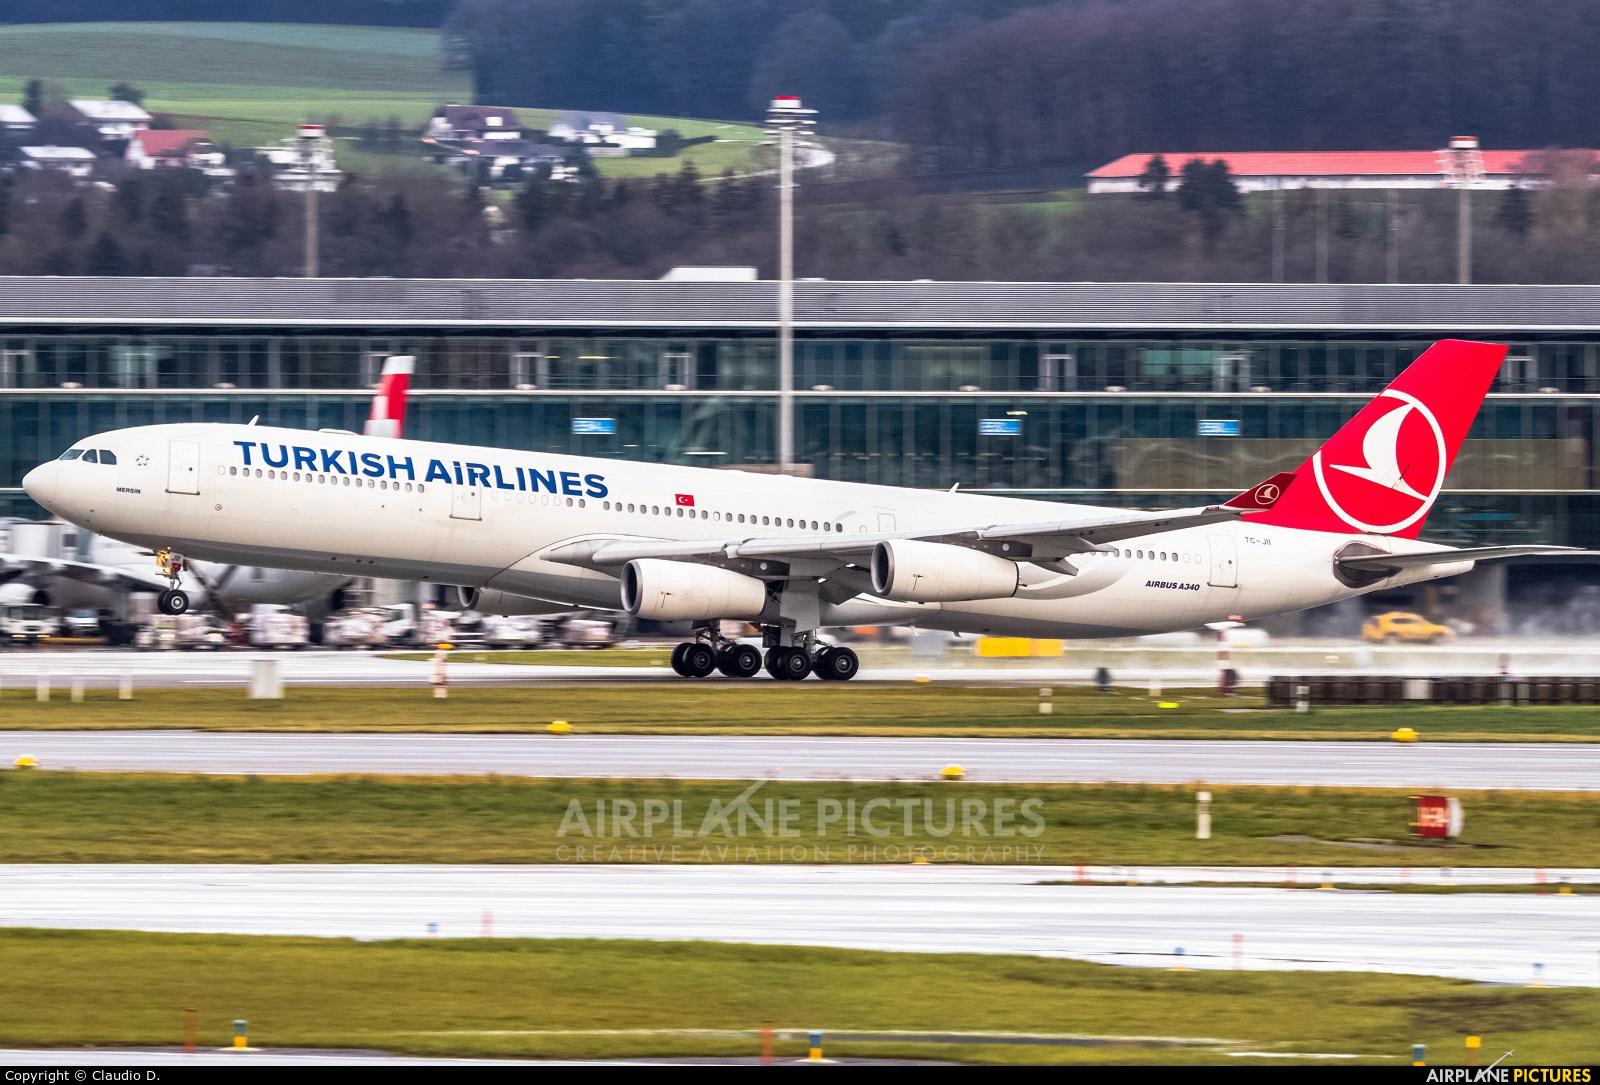 Turkish Airlines TC-JII aircraft at Zurich